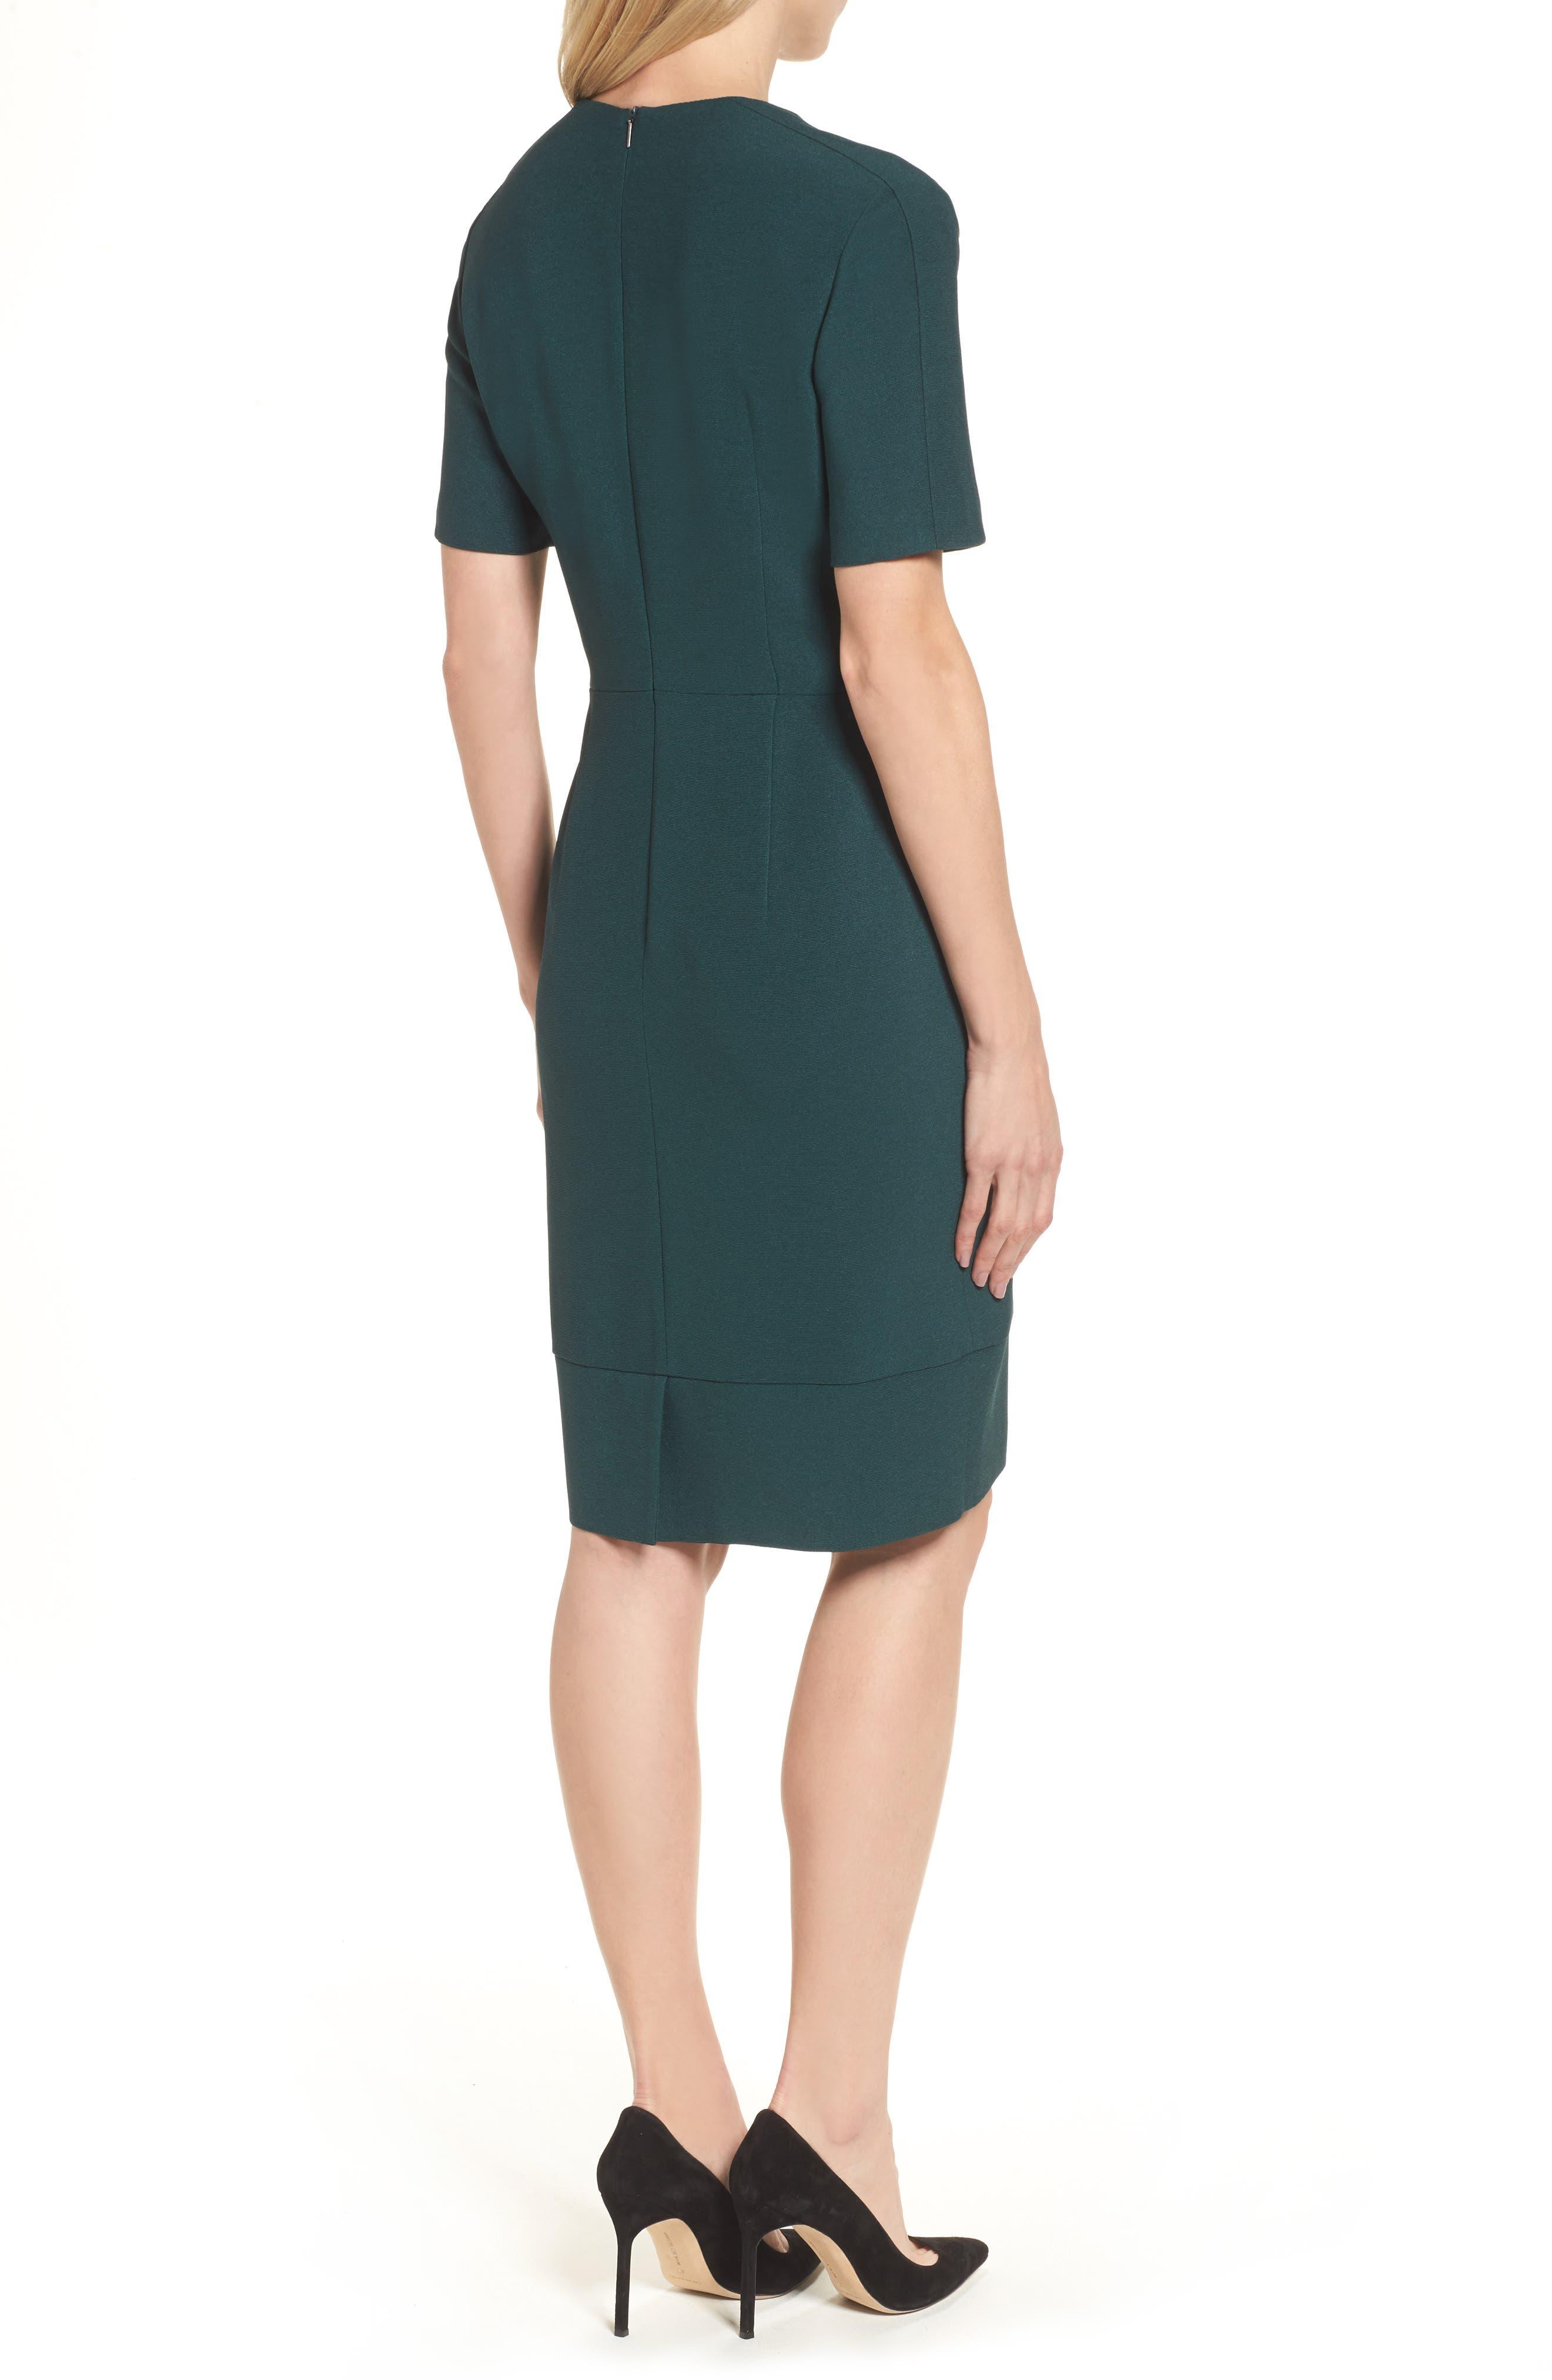 Dalesana Sheath Dress,                             Alternate thumbnail 2, color,                             Peacock Green